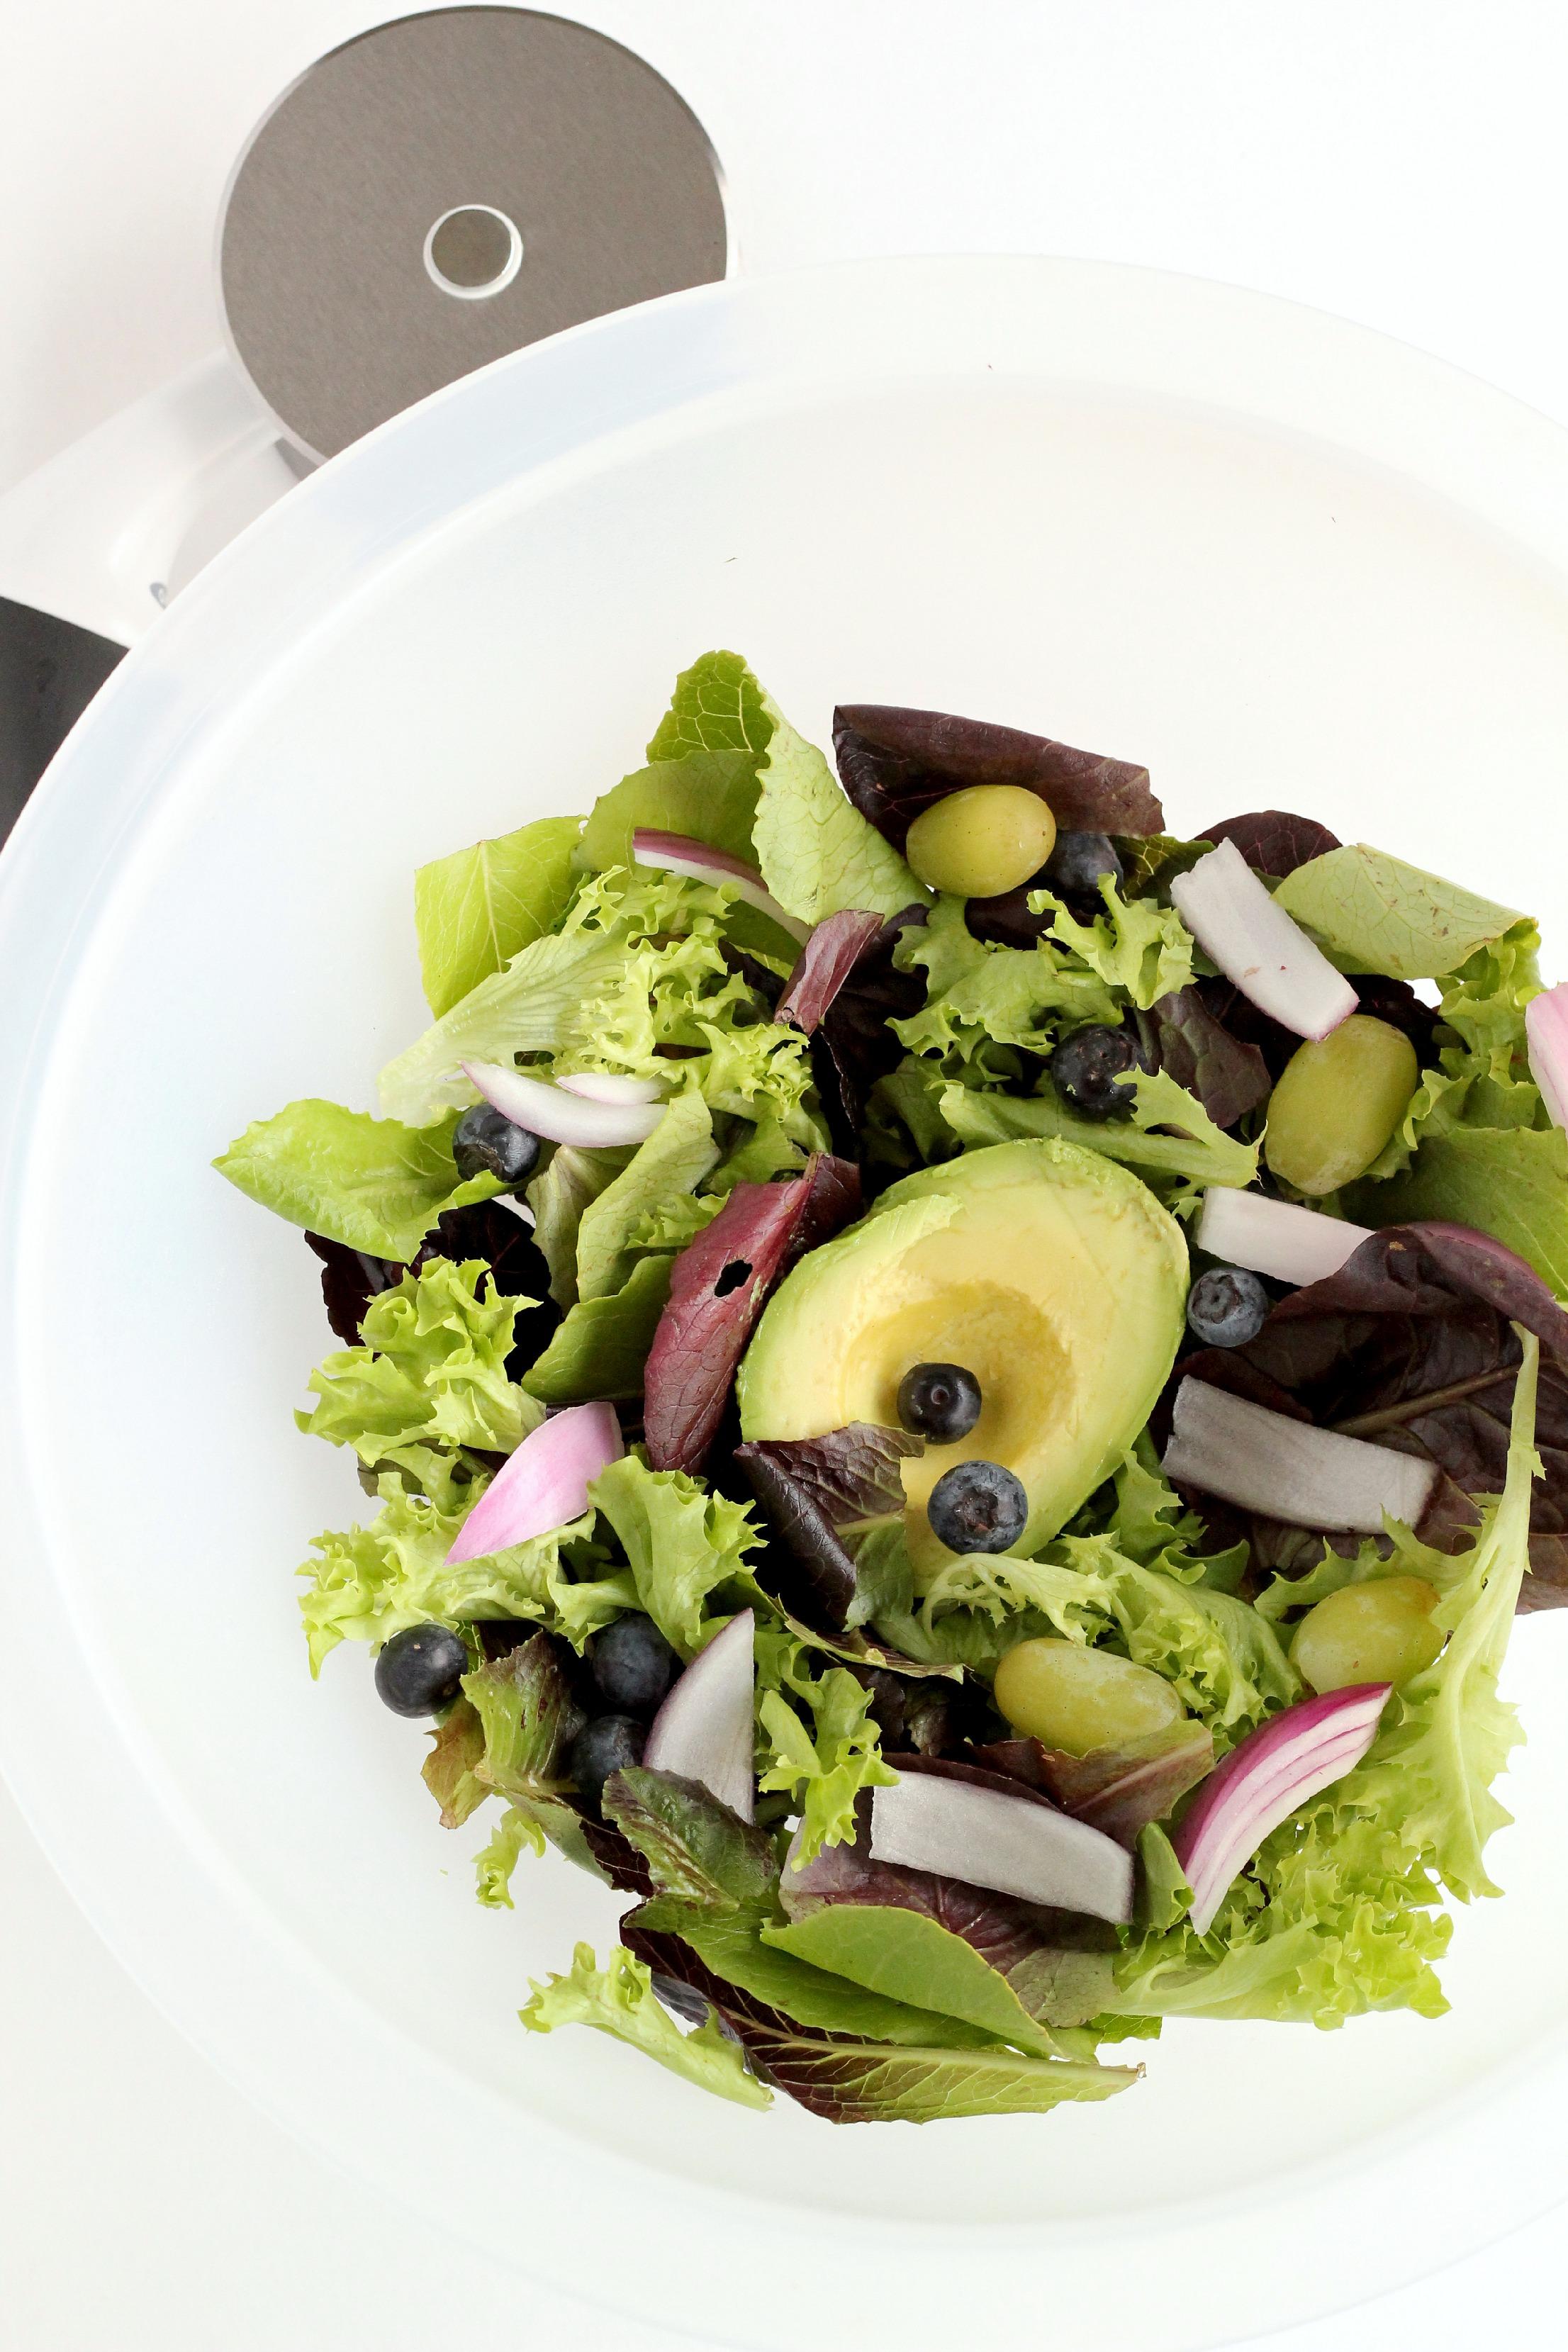 How to make salads taste better